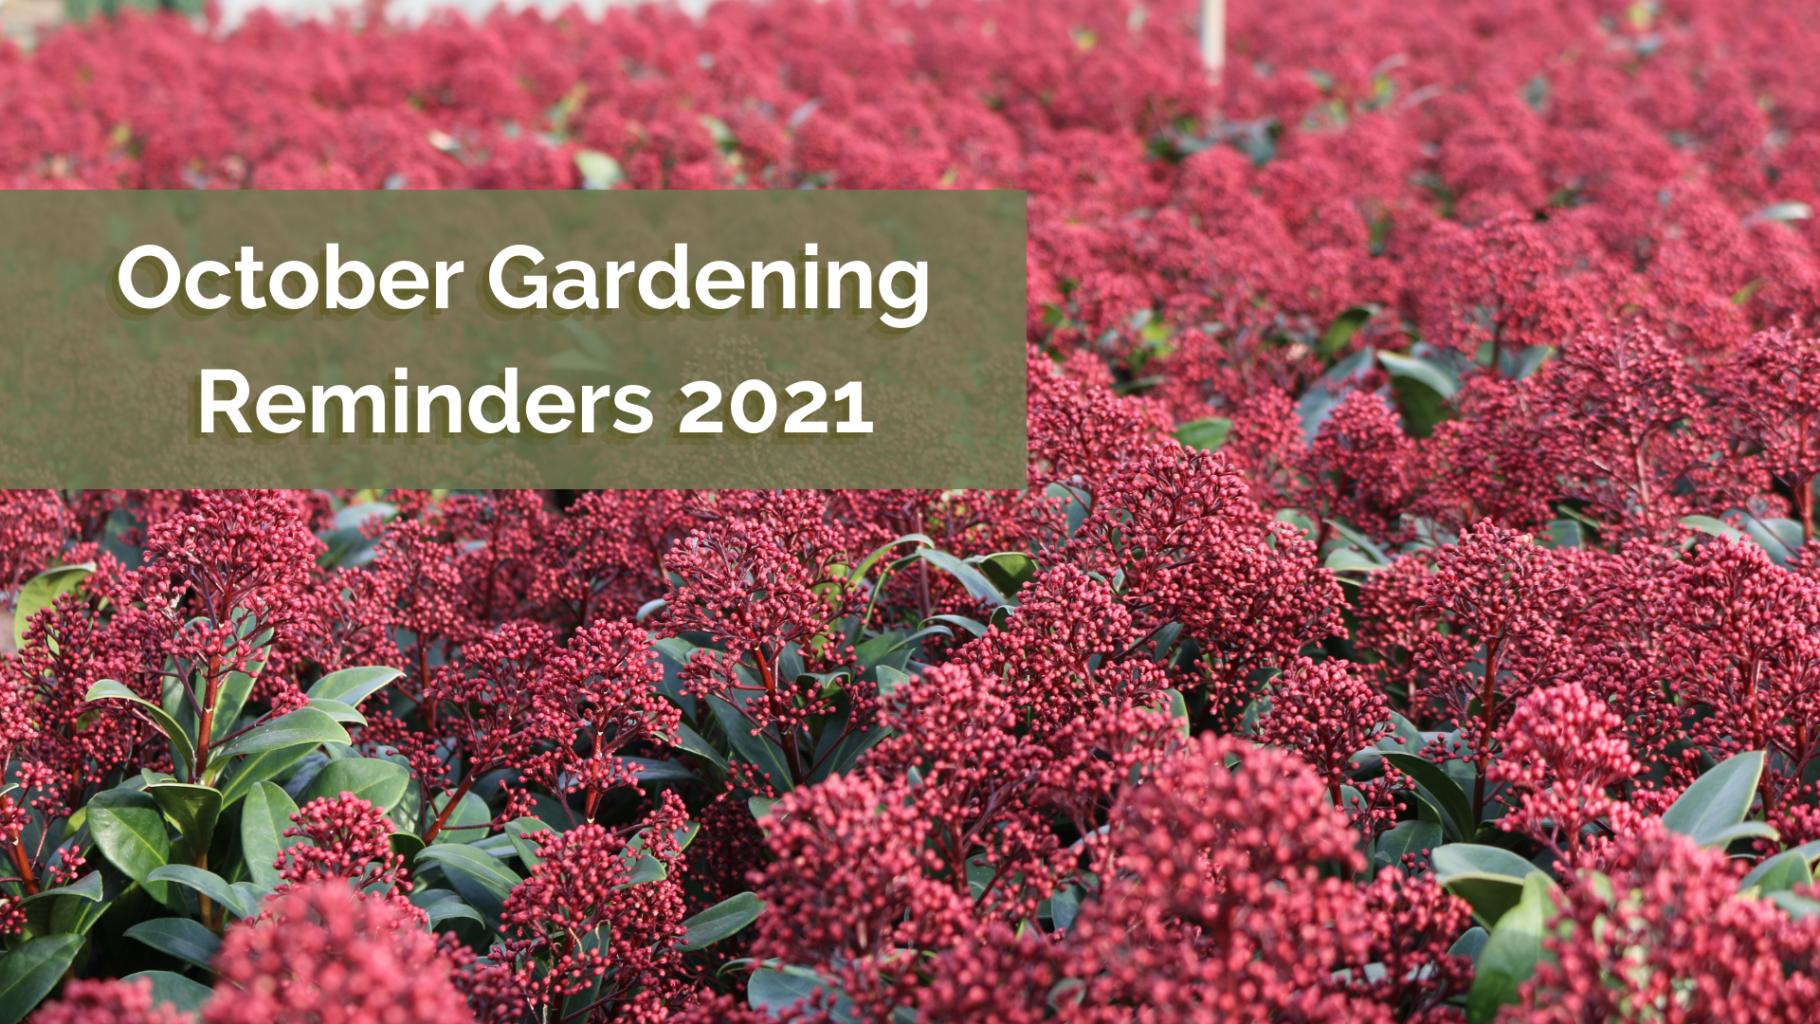 October Gardening Reminders 2021